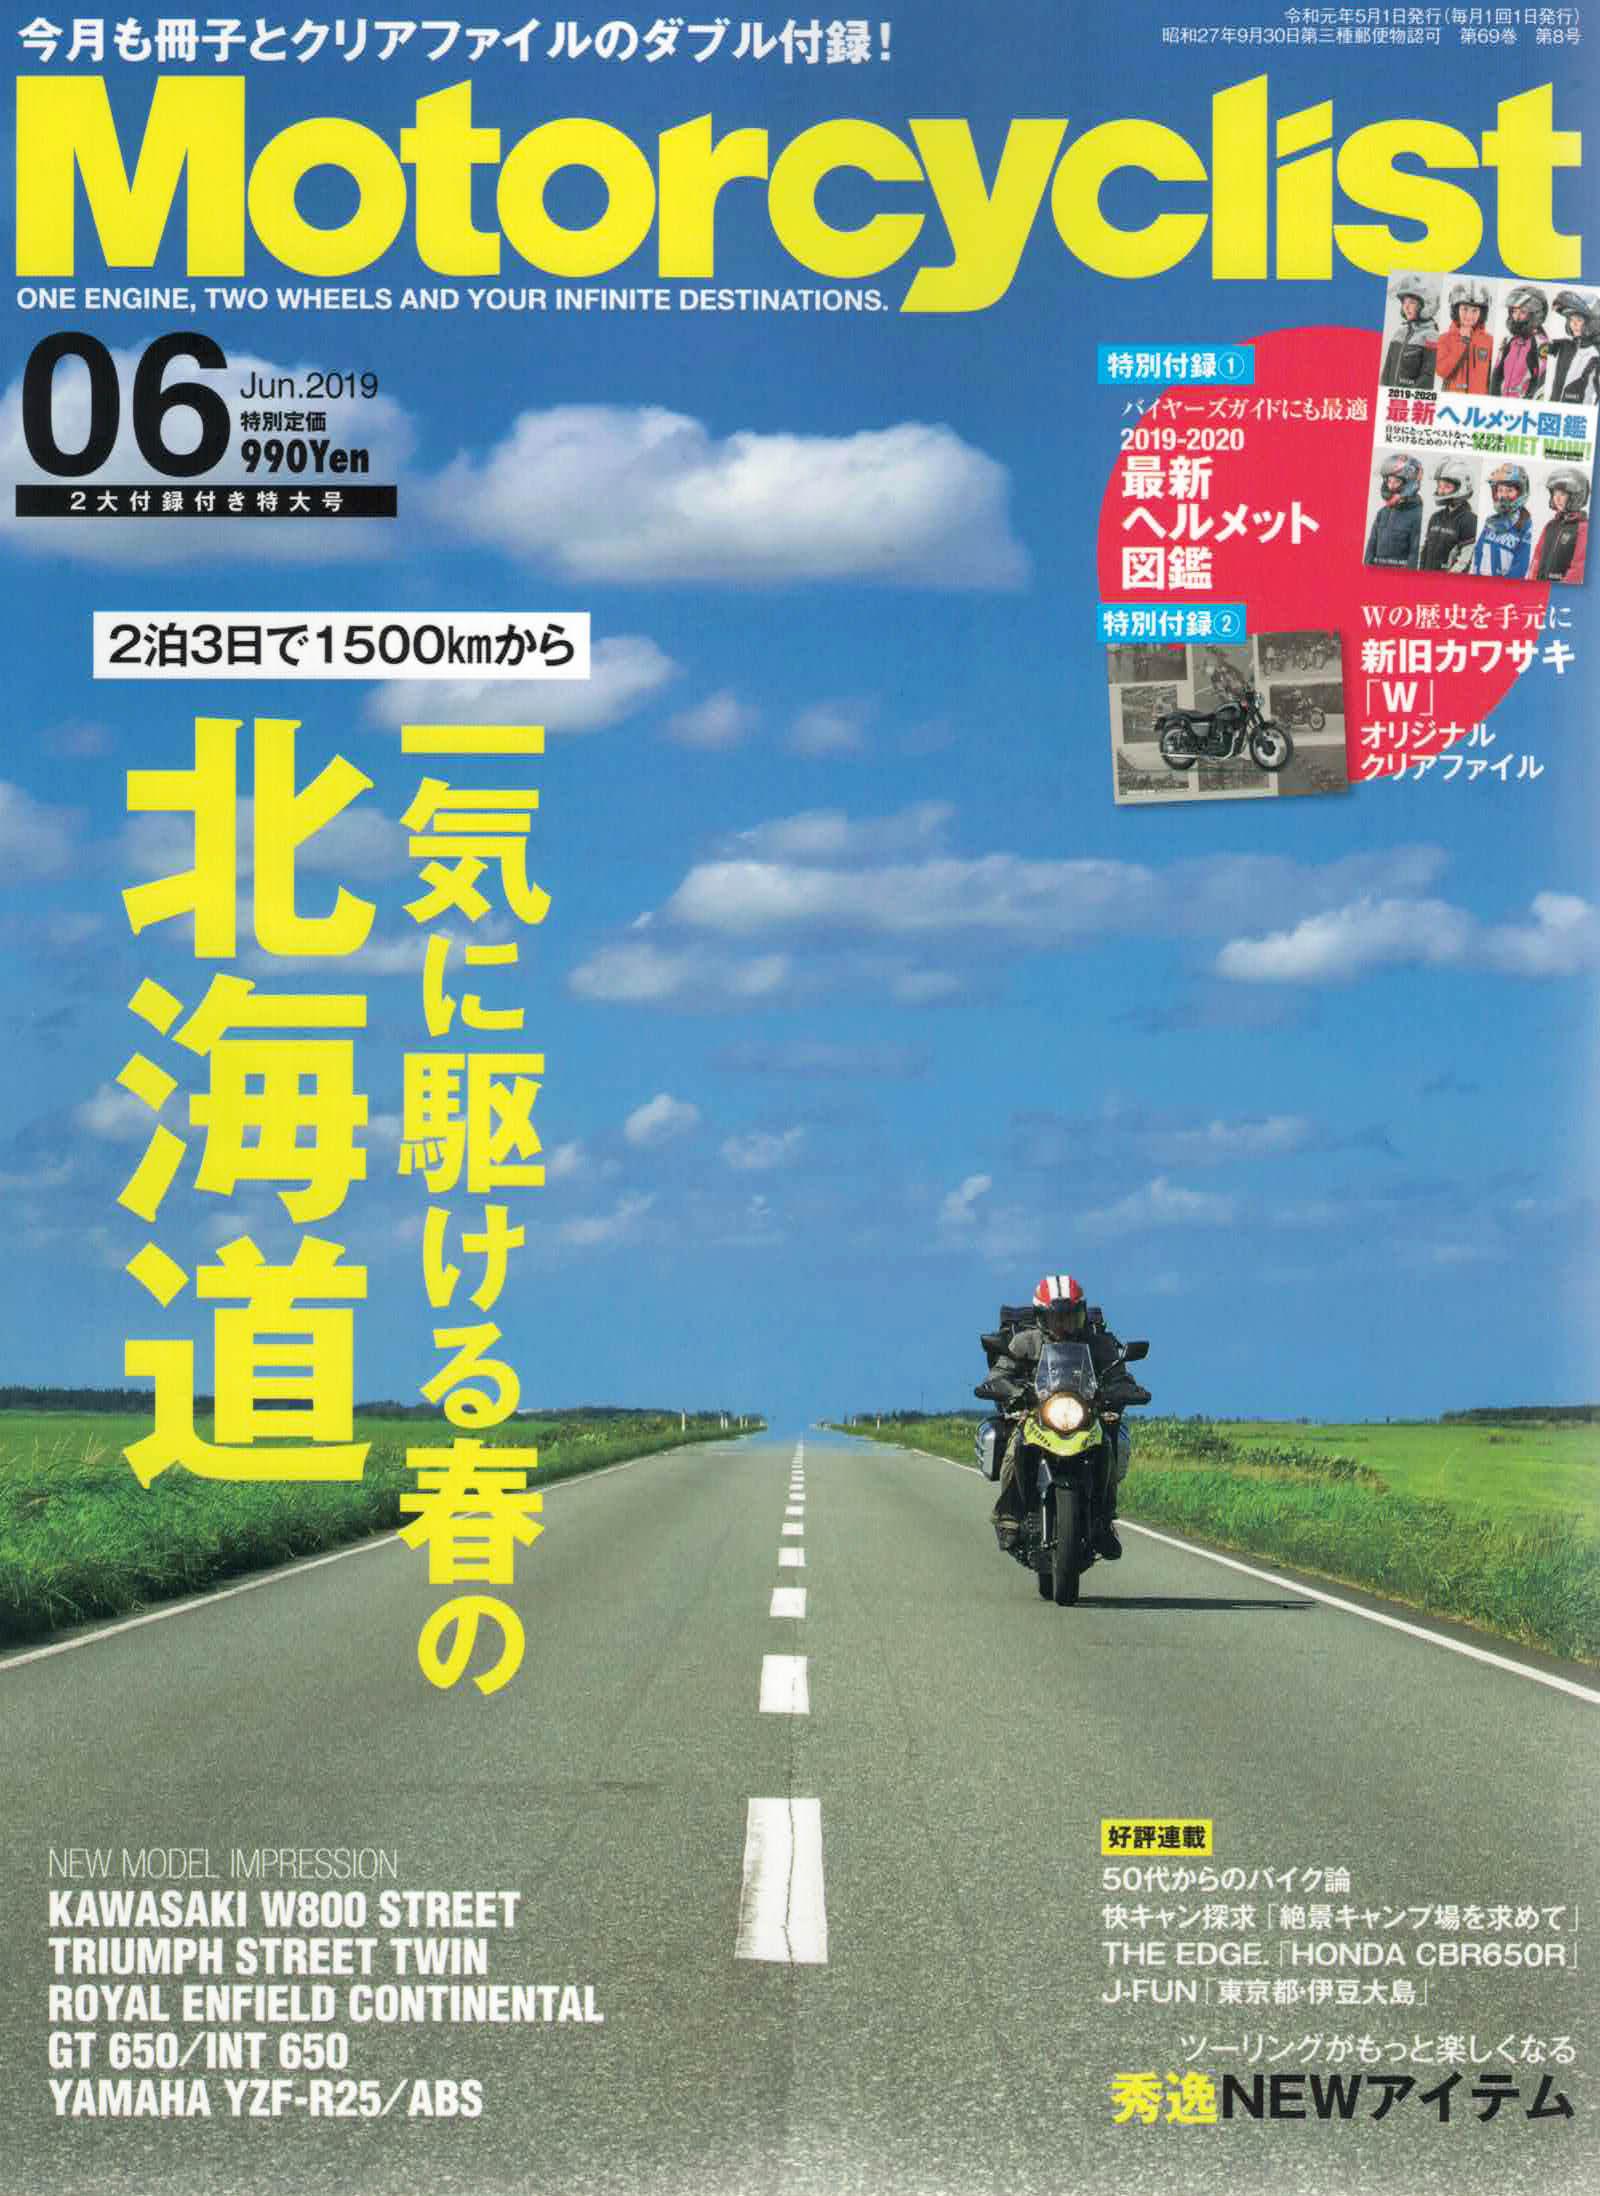 【Motorcyclist6月号掲載】Lambretta